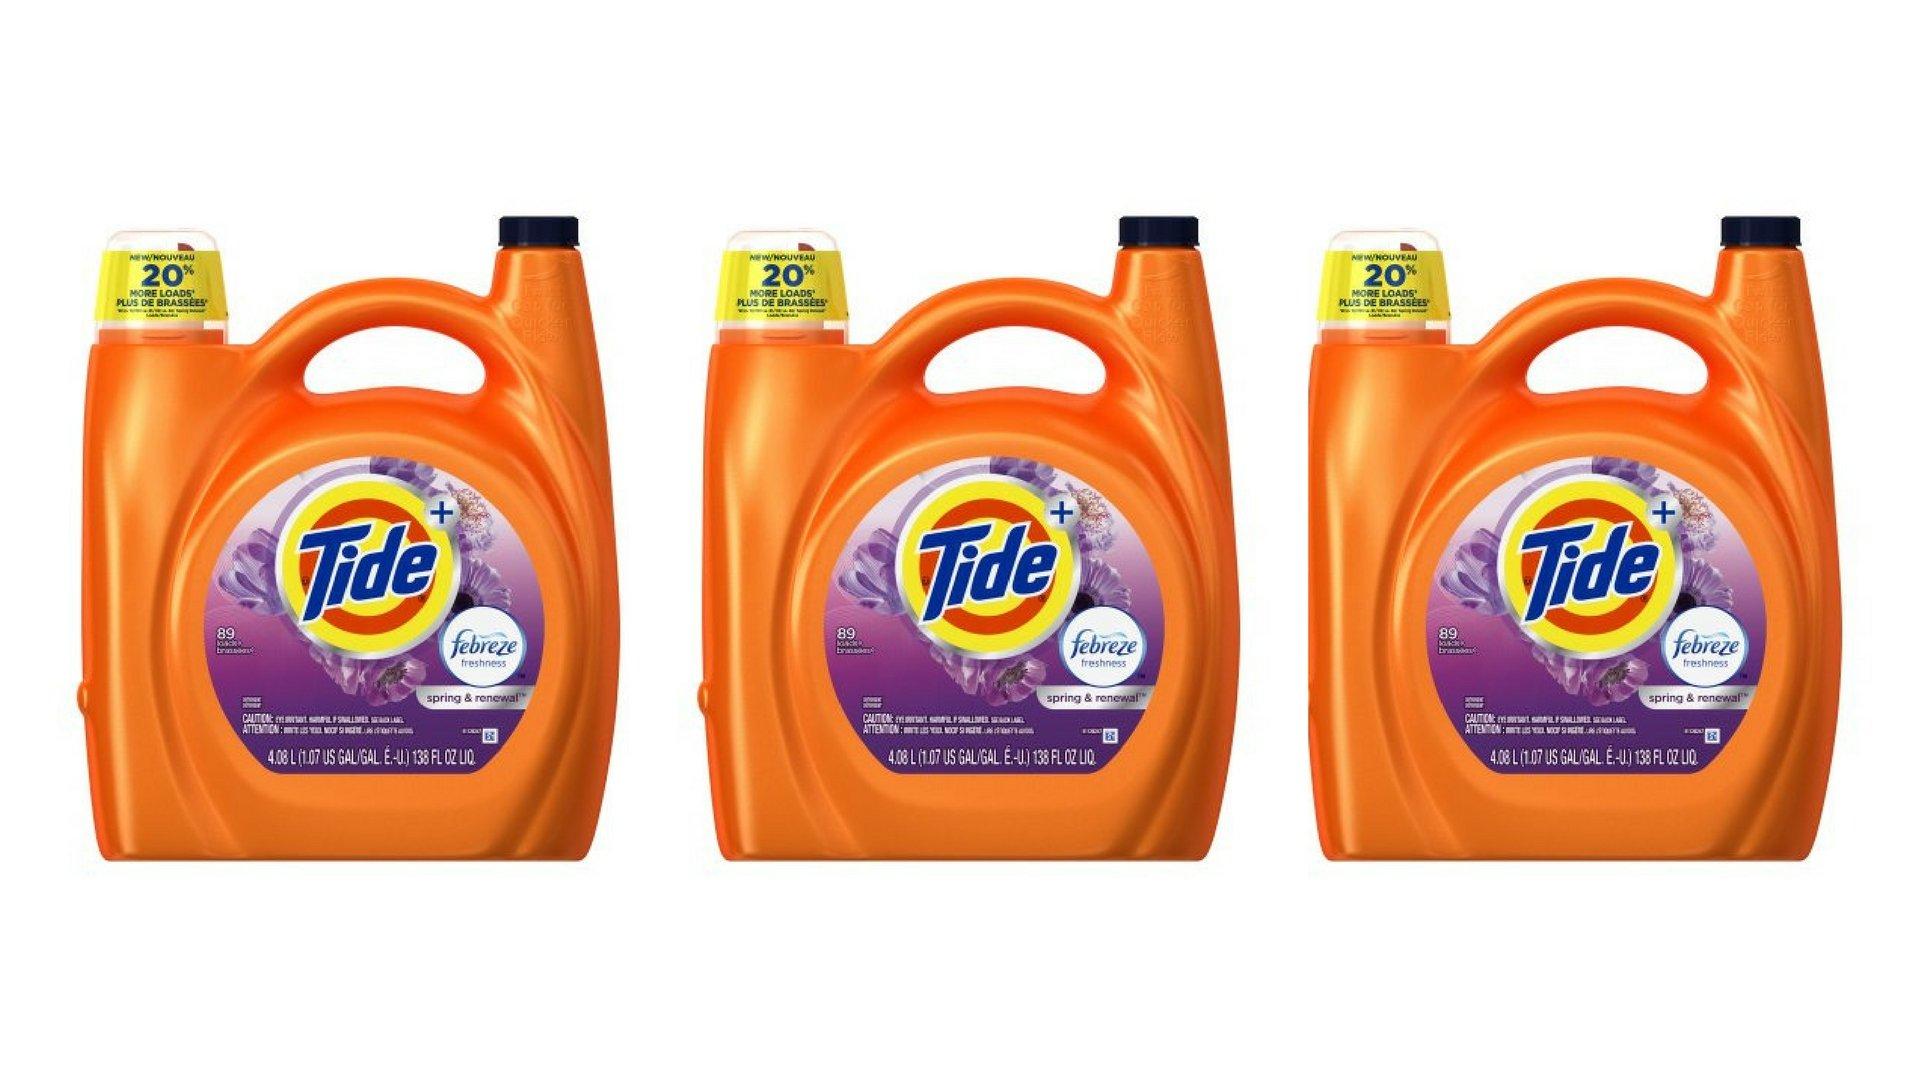 Tïde Plus Febreze Freshness Spring and Renewal Scent Liquid Laundry Detergent 138 fl oz per bottle set of 3